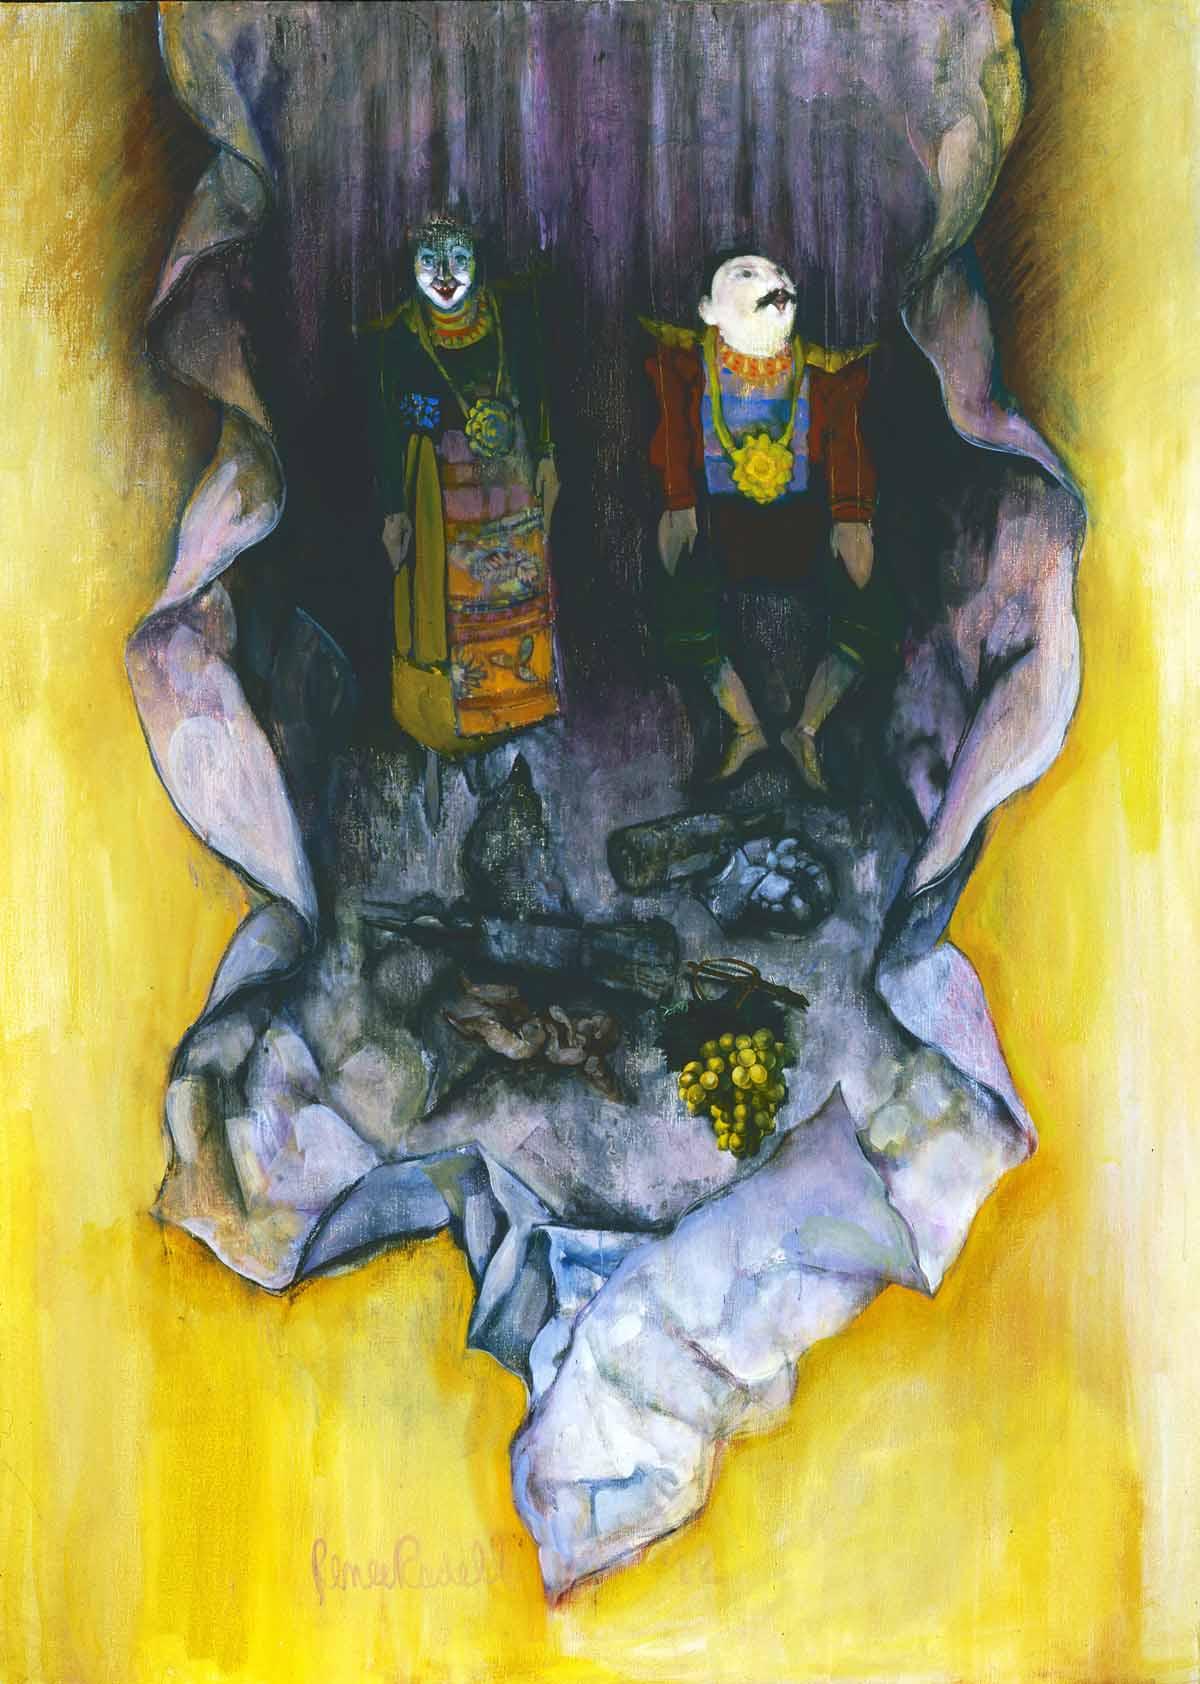 creativity 1990s art artist series